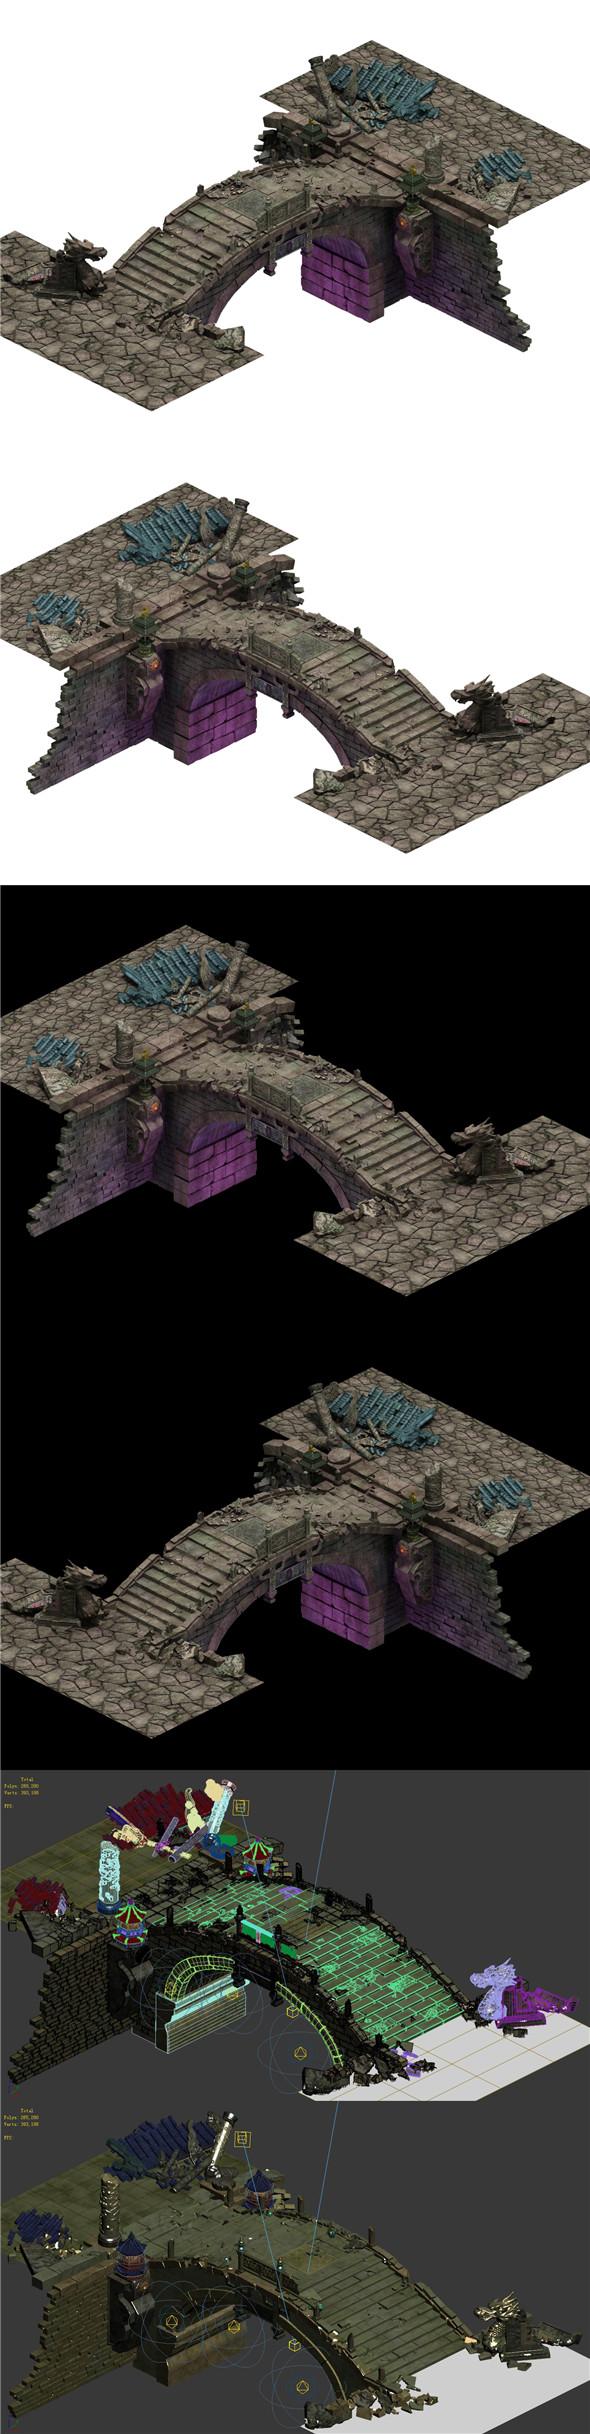 Building ruins - broken stone bridge - 3DOcean Item for Sale